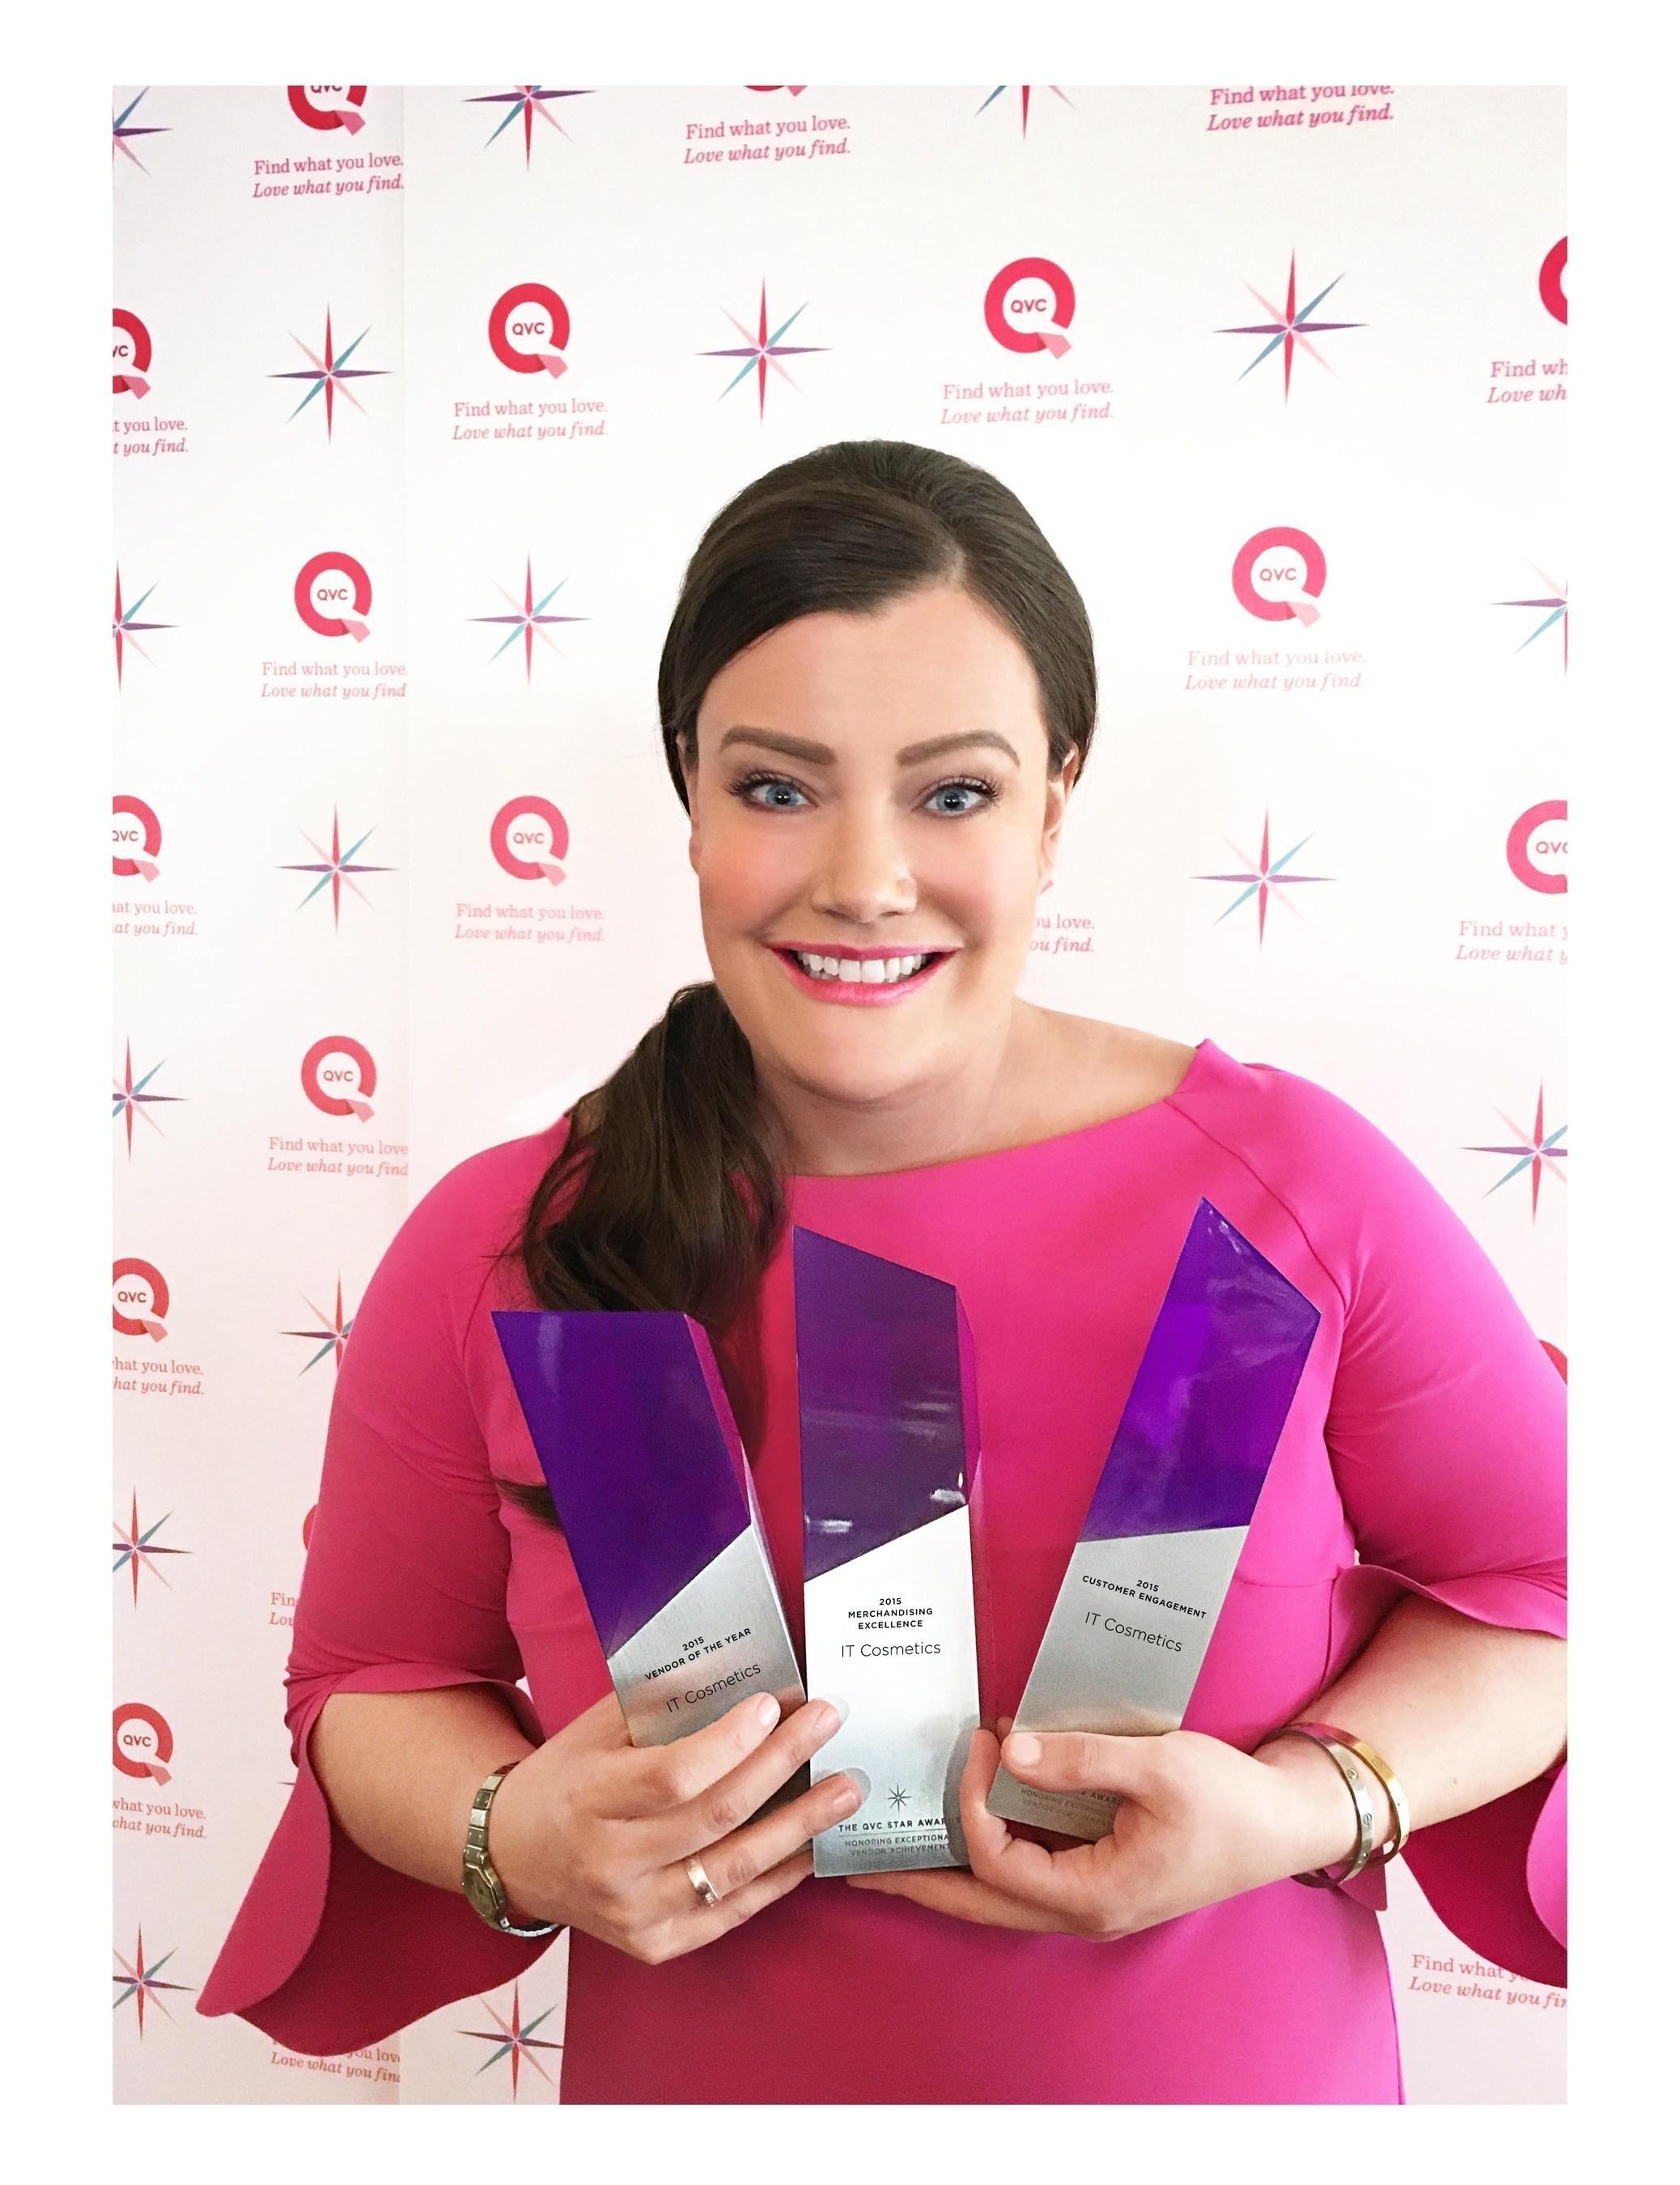 It Cosmetics Wins Qvc Vendor Of The Year Award